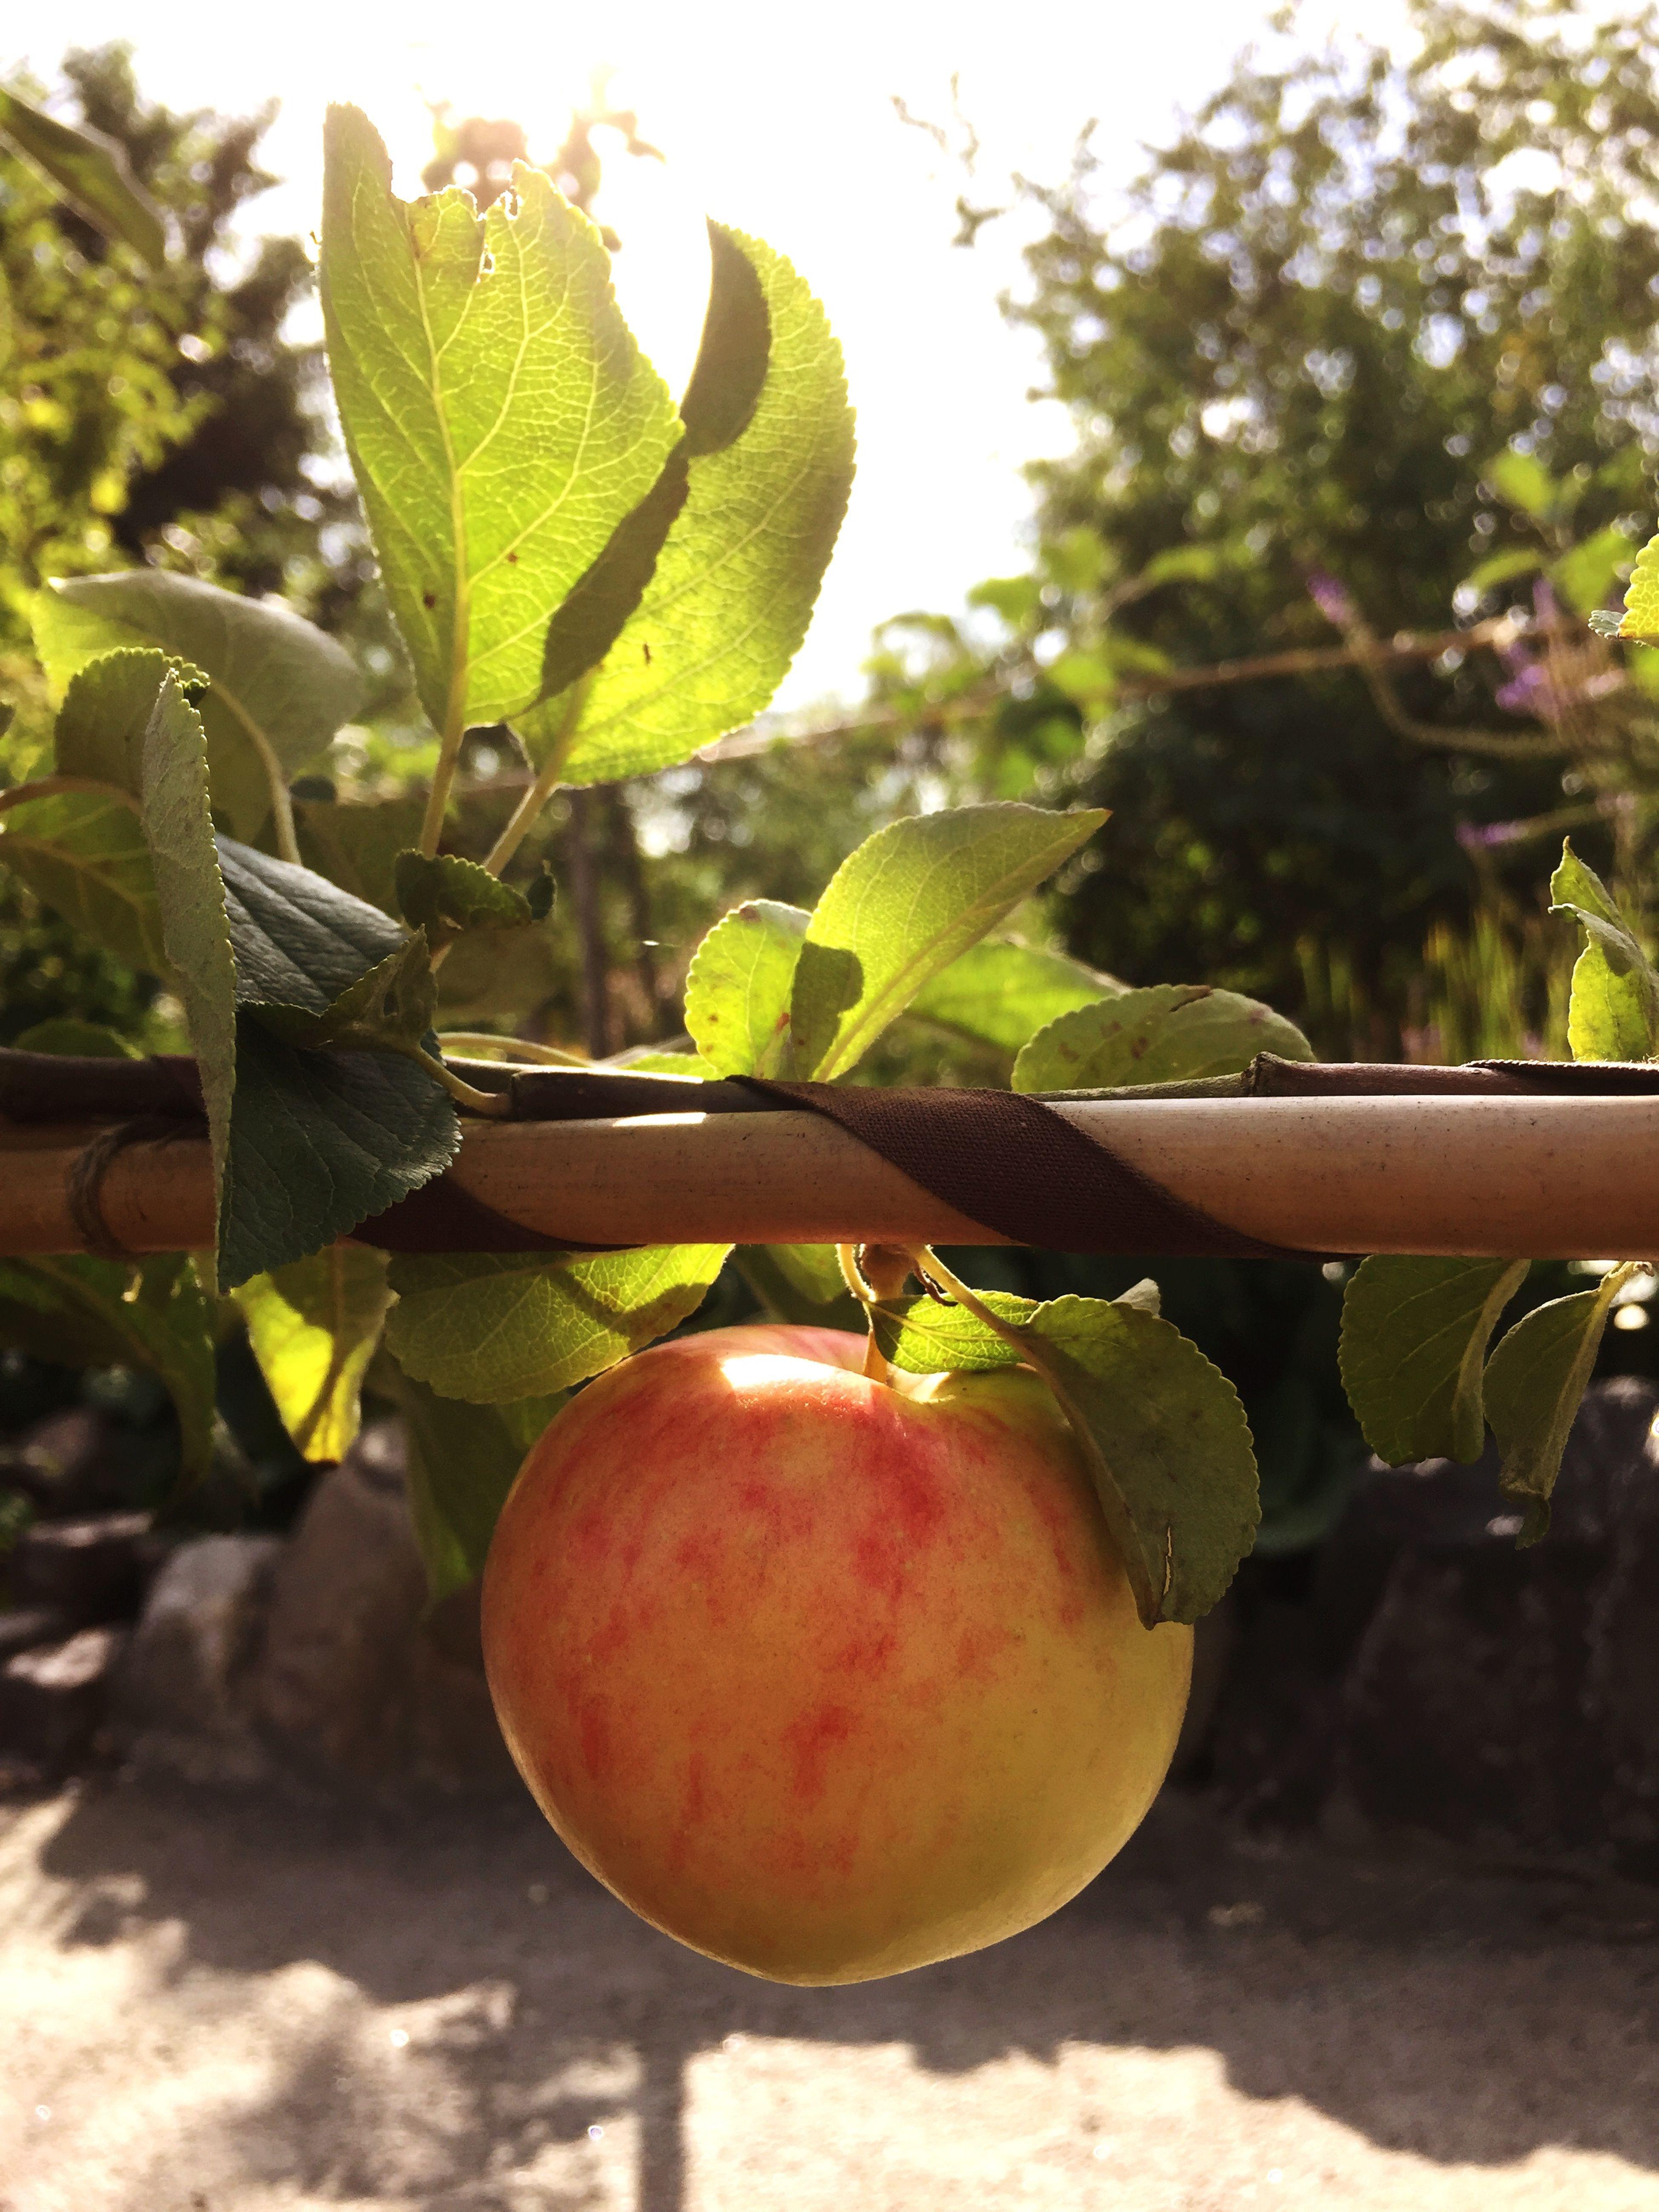 Apple Garden Gardening Espalier Flowers,Plants & Garden Apple Tree Summer Summertime